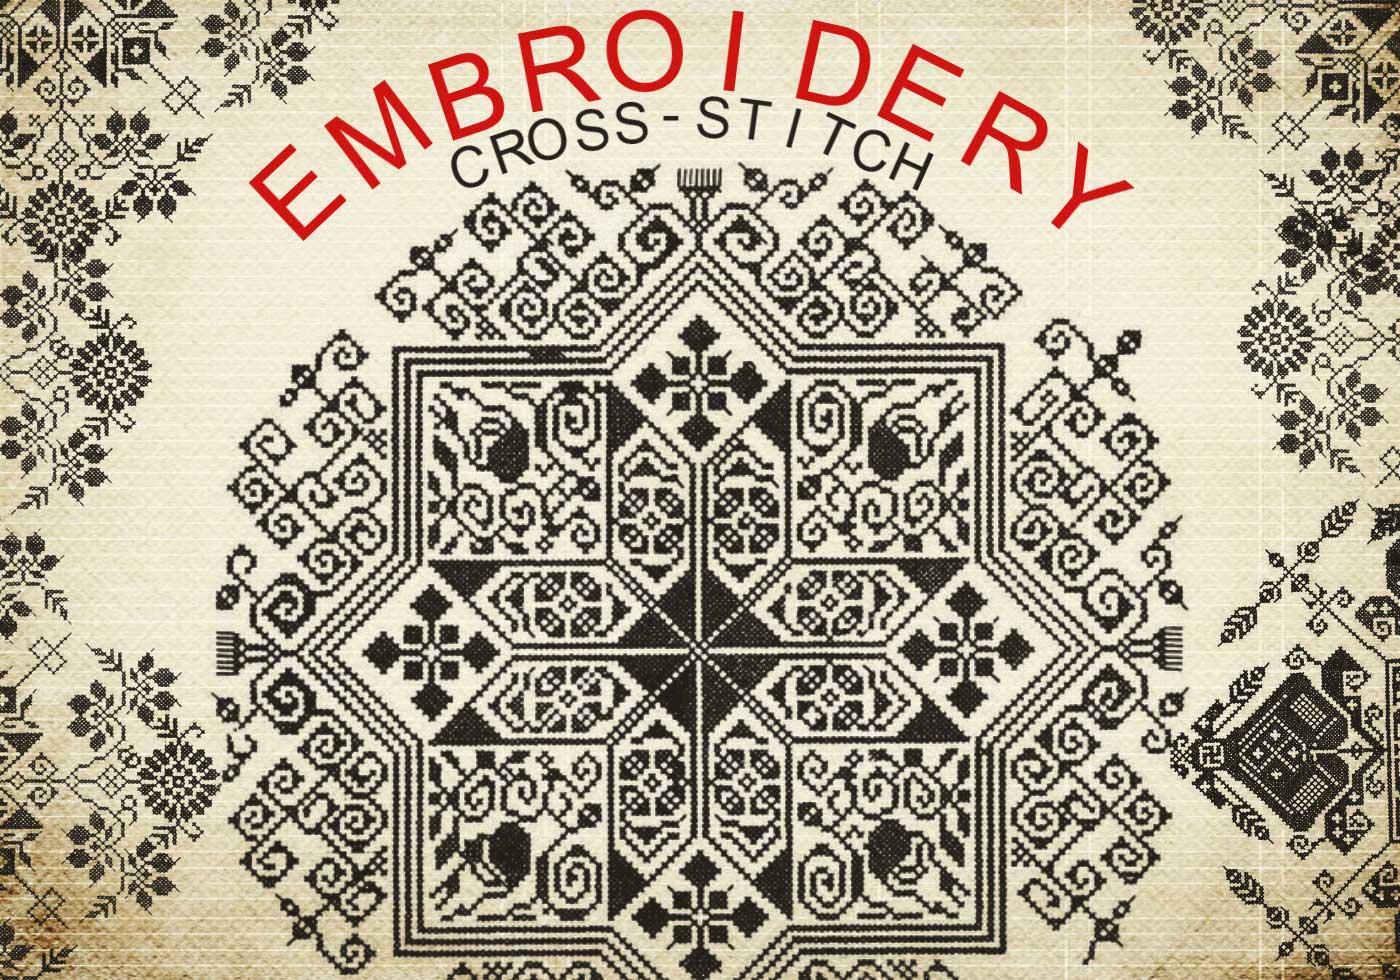 Embroidery-photoshop-brushes